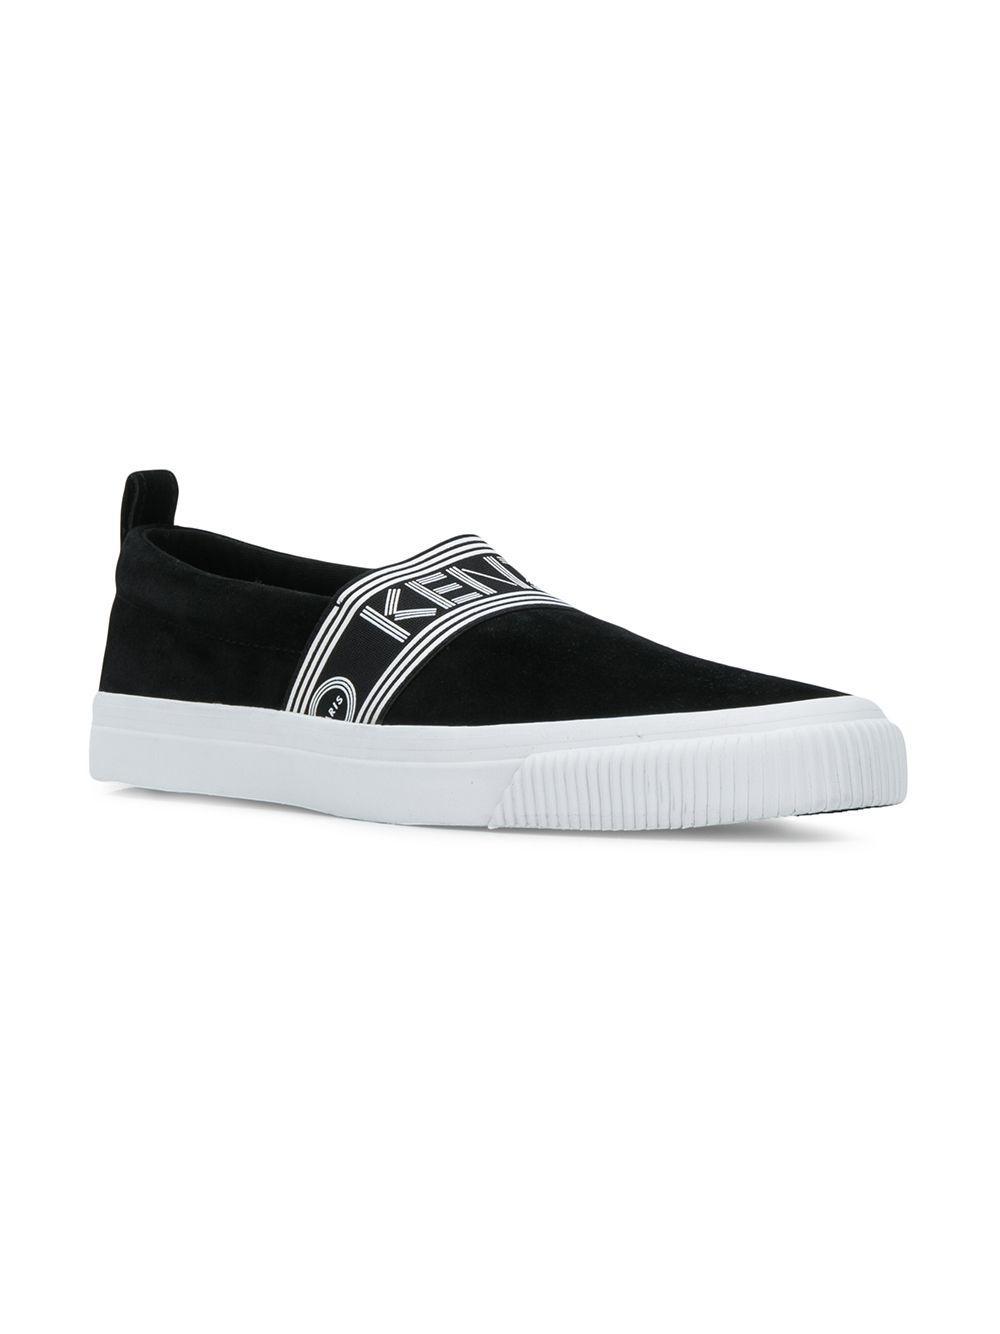 3642dcf7e10a Lyst - KENZO Kapri Slip-on Sneakers in Black - Save 36%